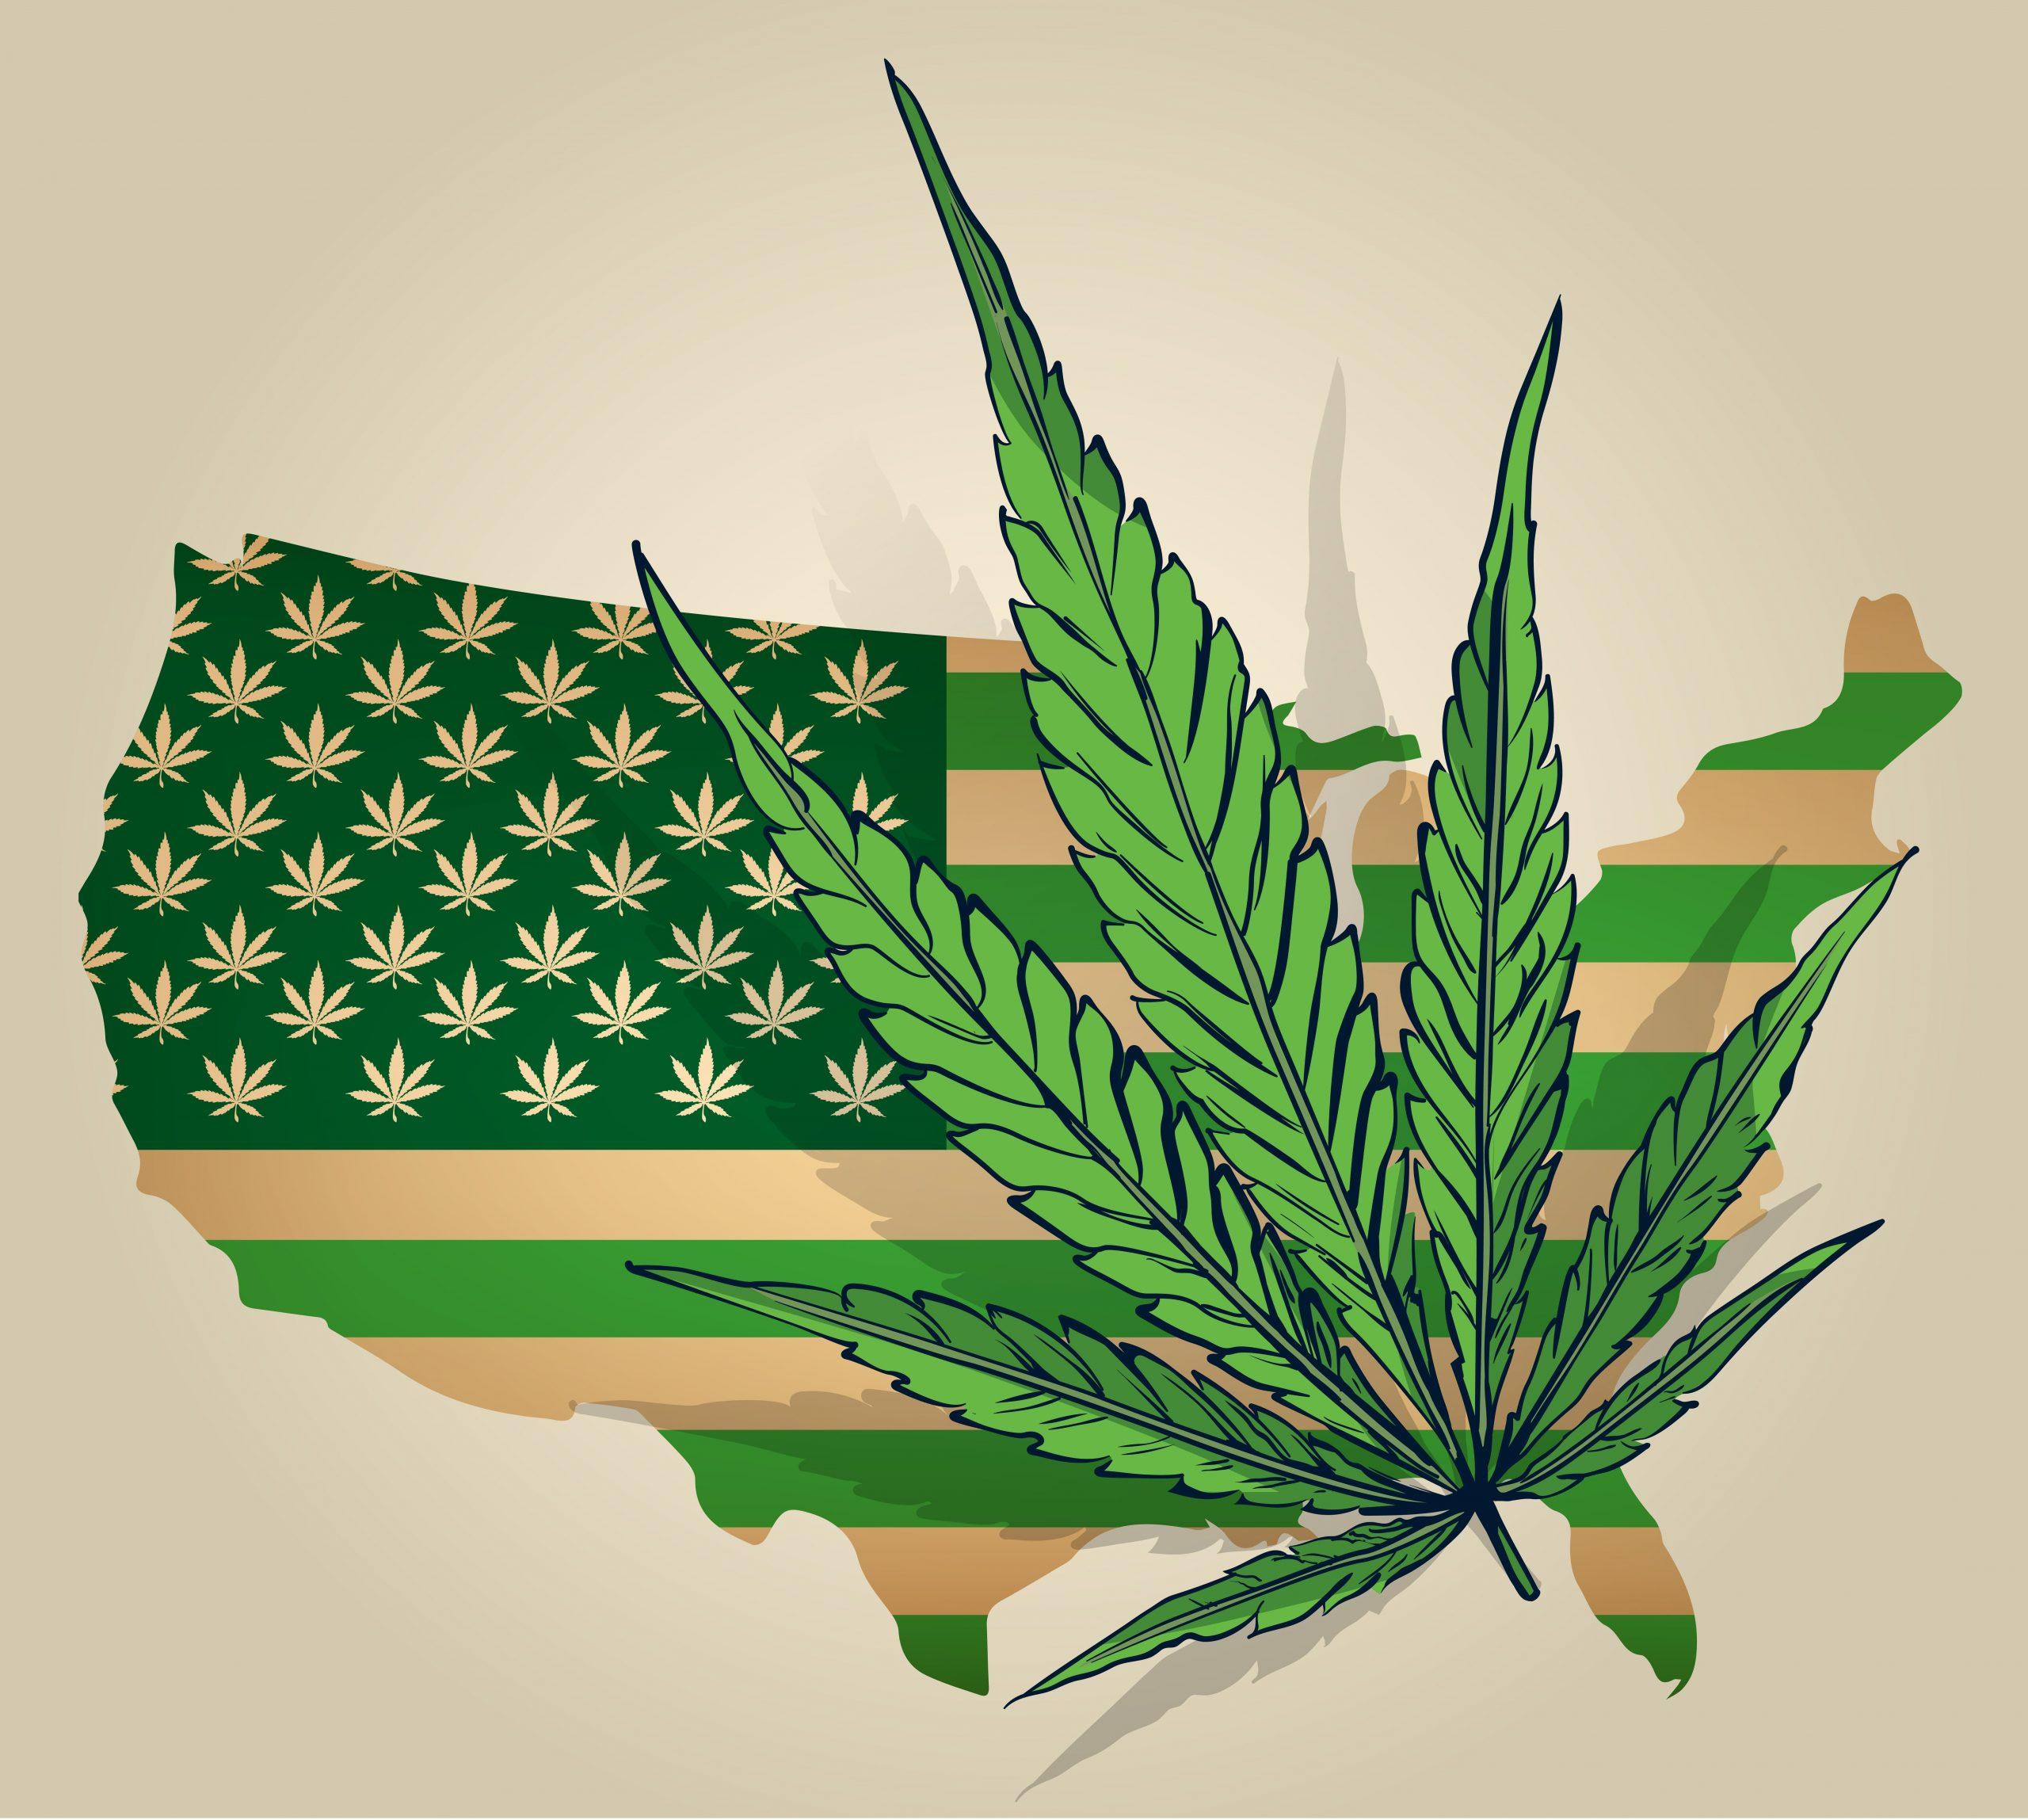 states hemp cultivation